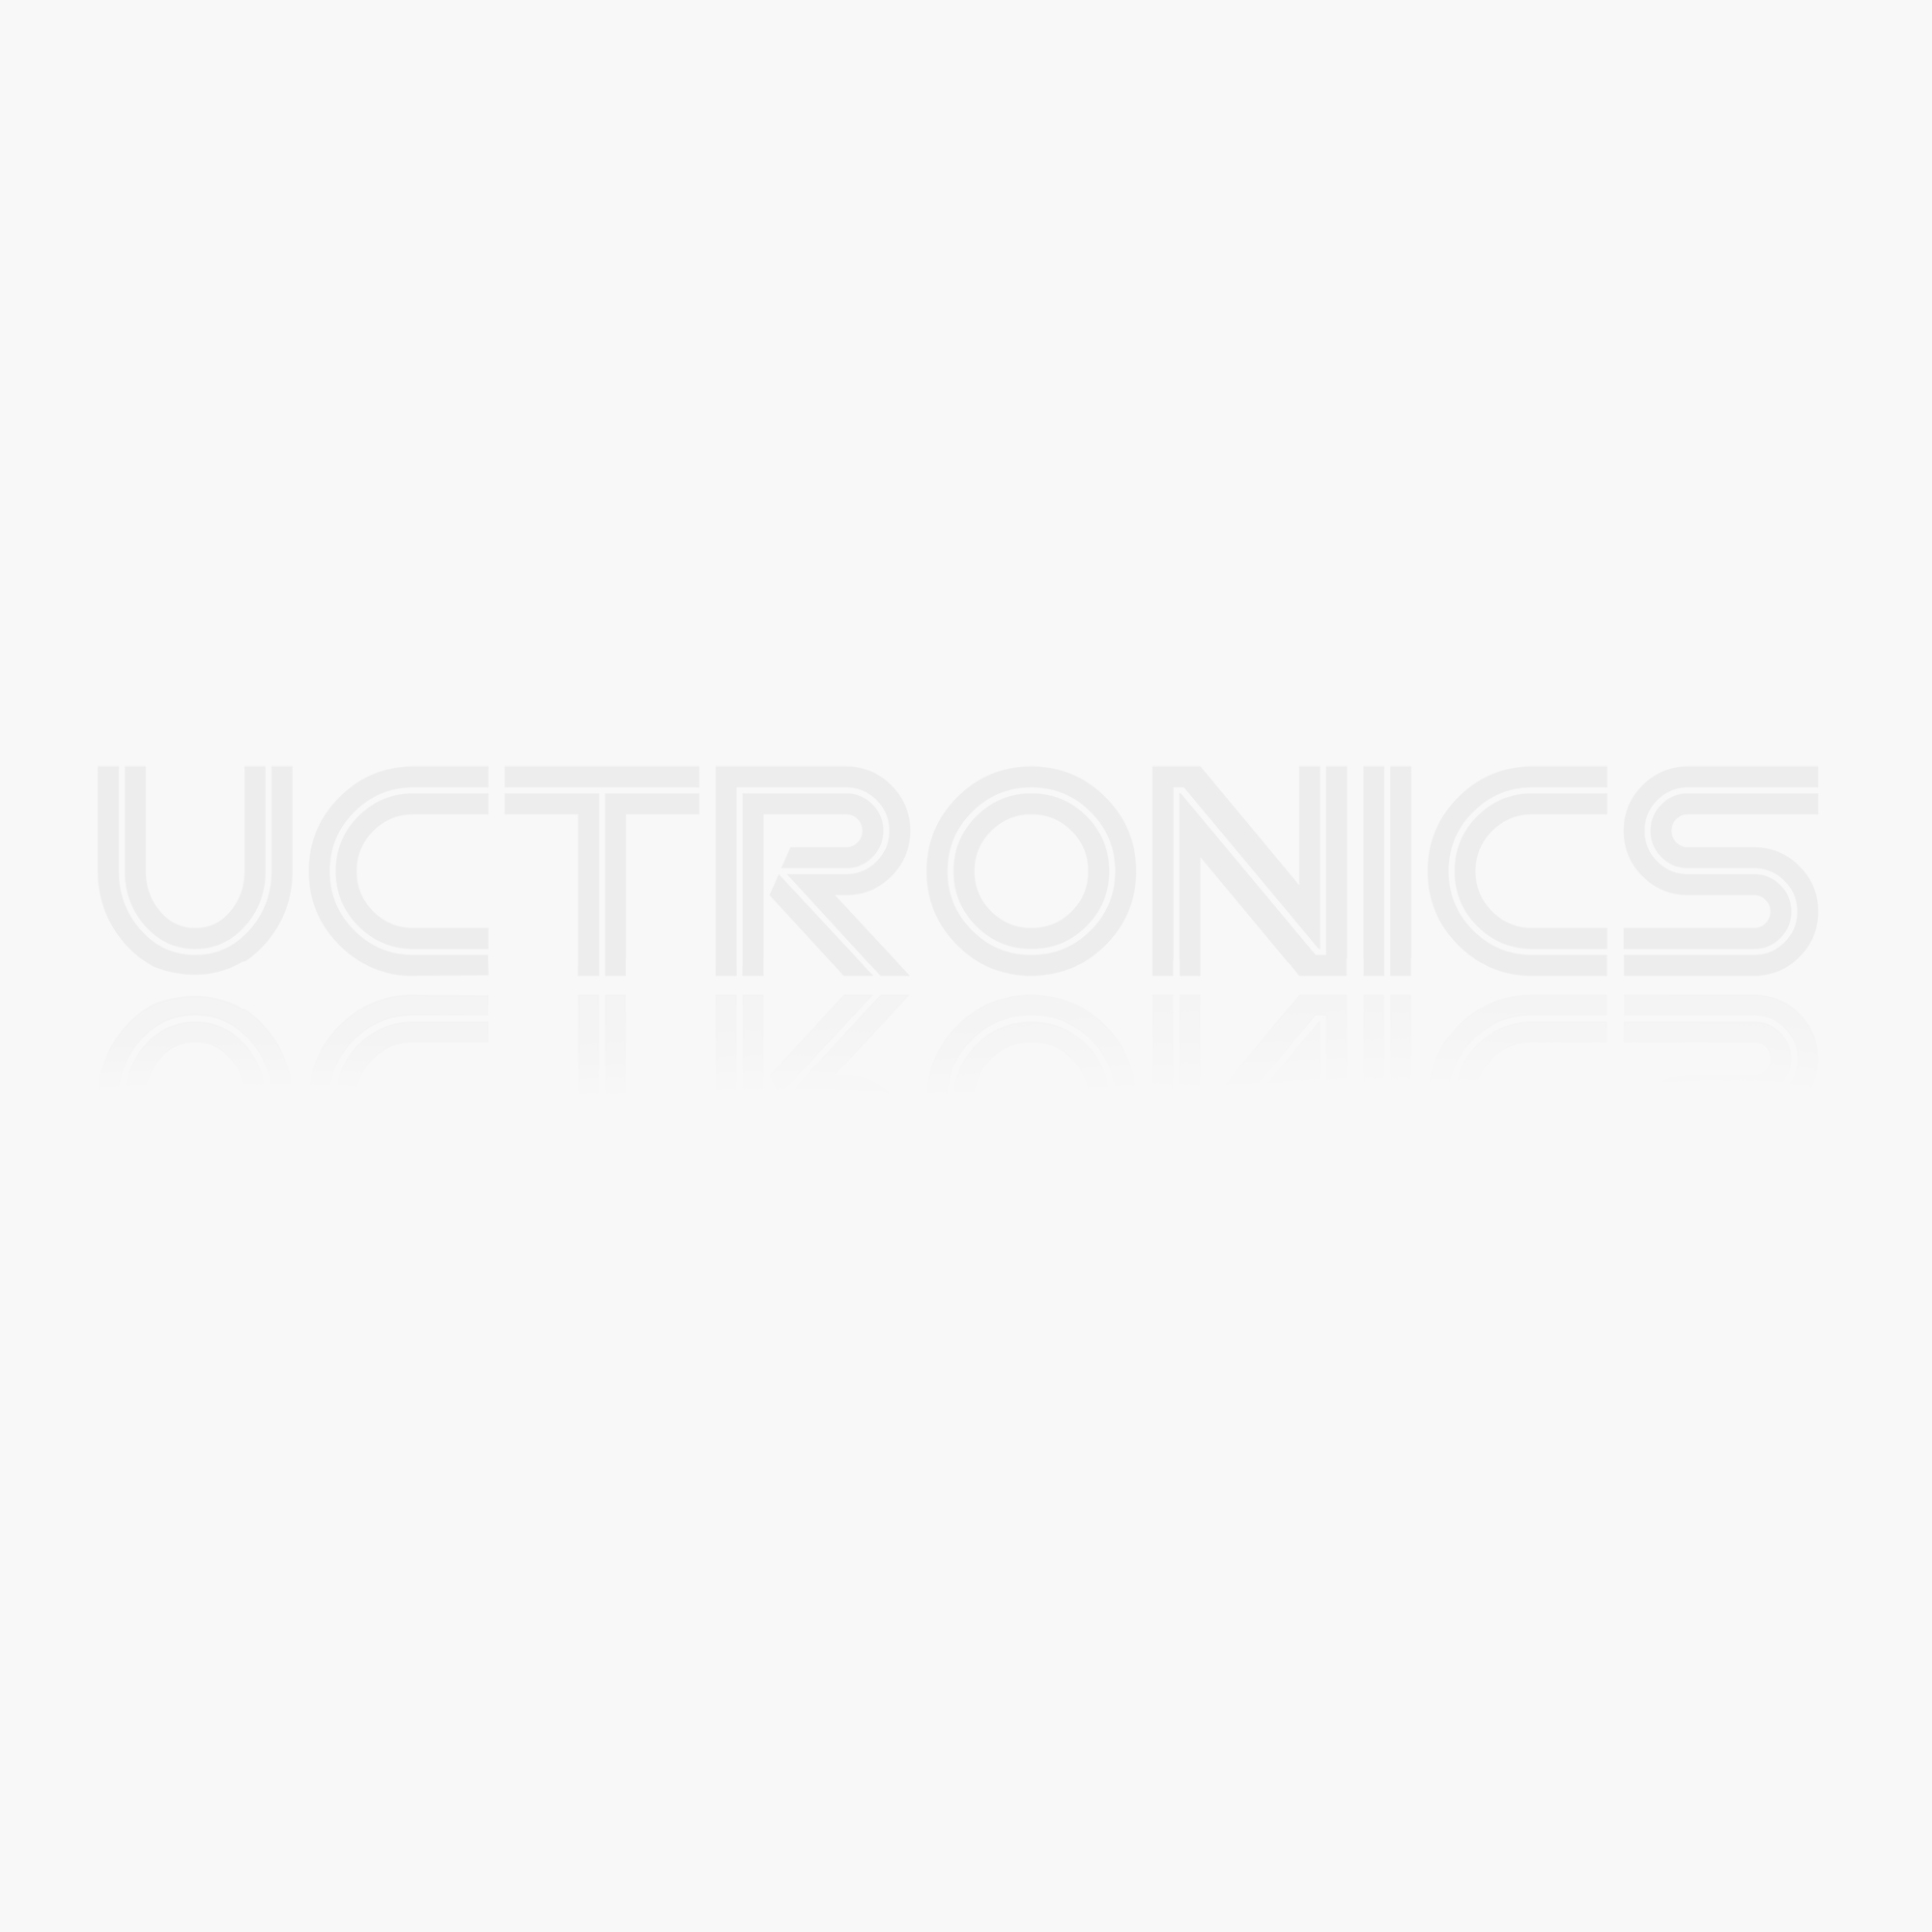 7x9cm Double Side Glass Fiber Prototyping PCB Board DIY Universal